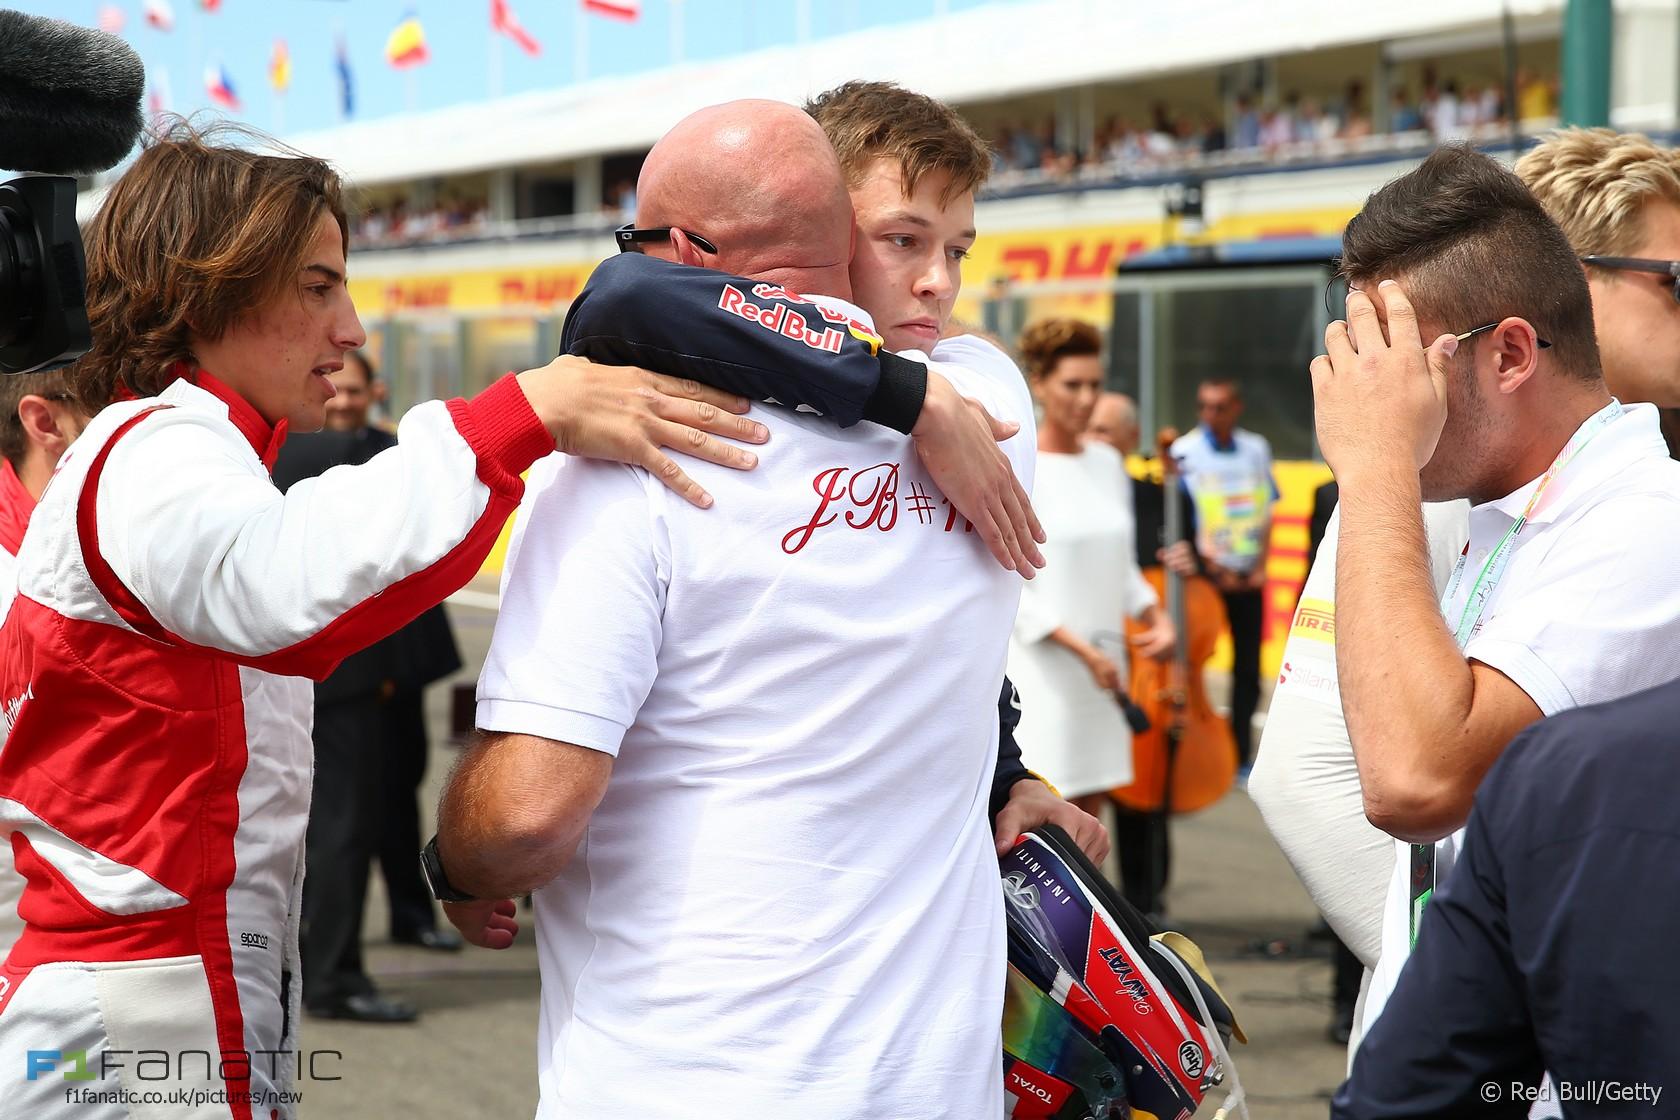 Daniil Kvyat, Red Bull, Hungaroring, 2015